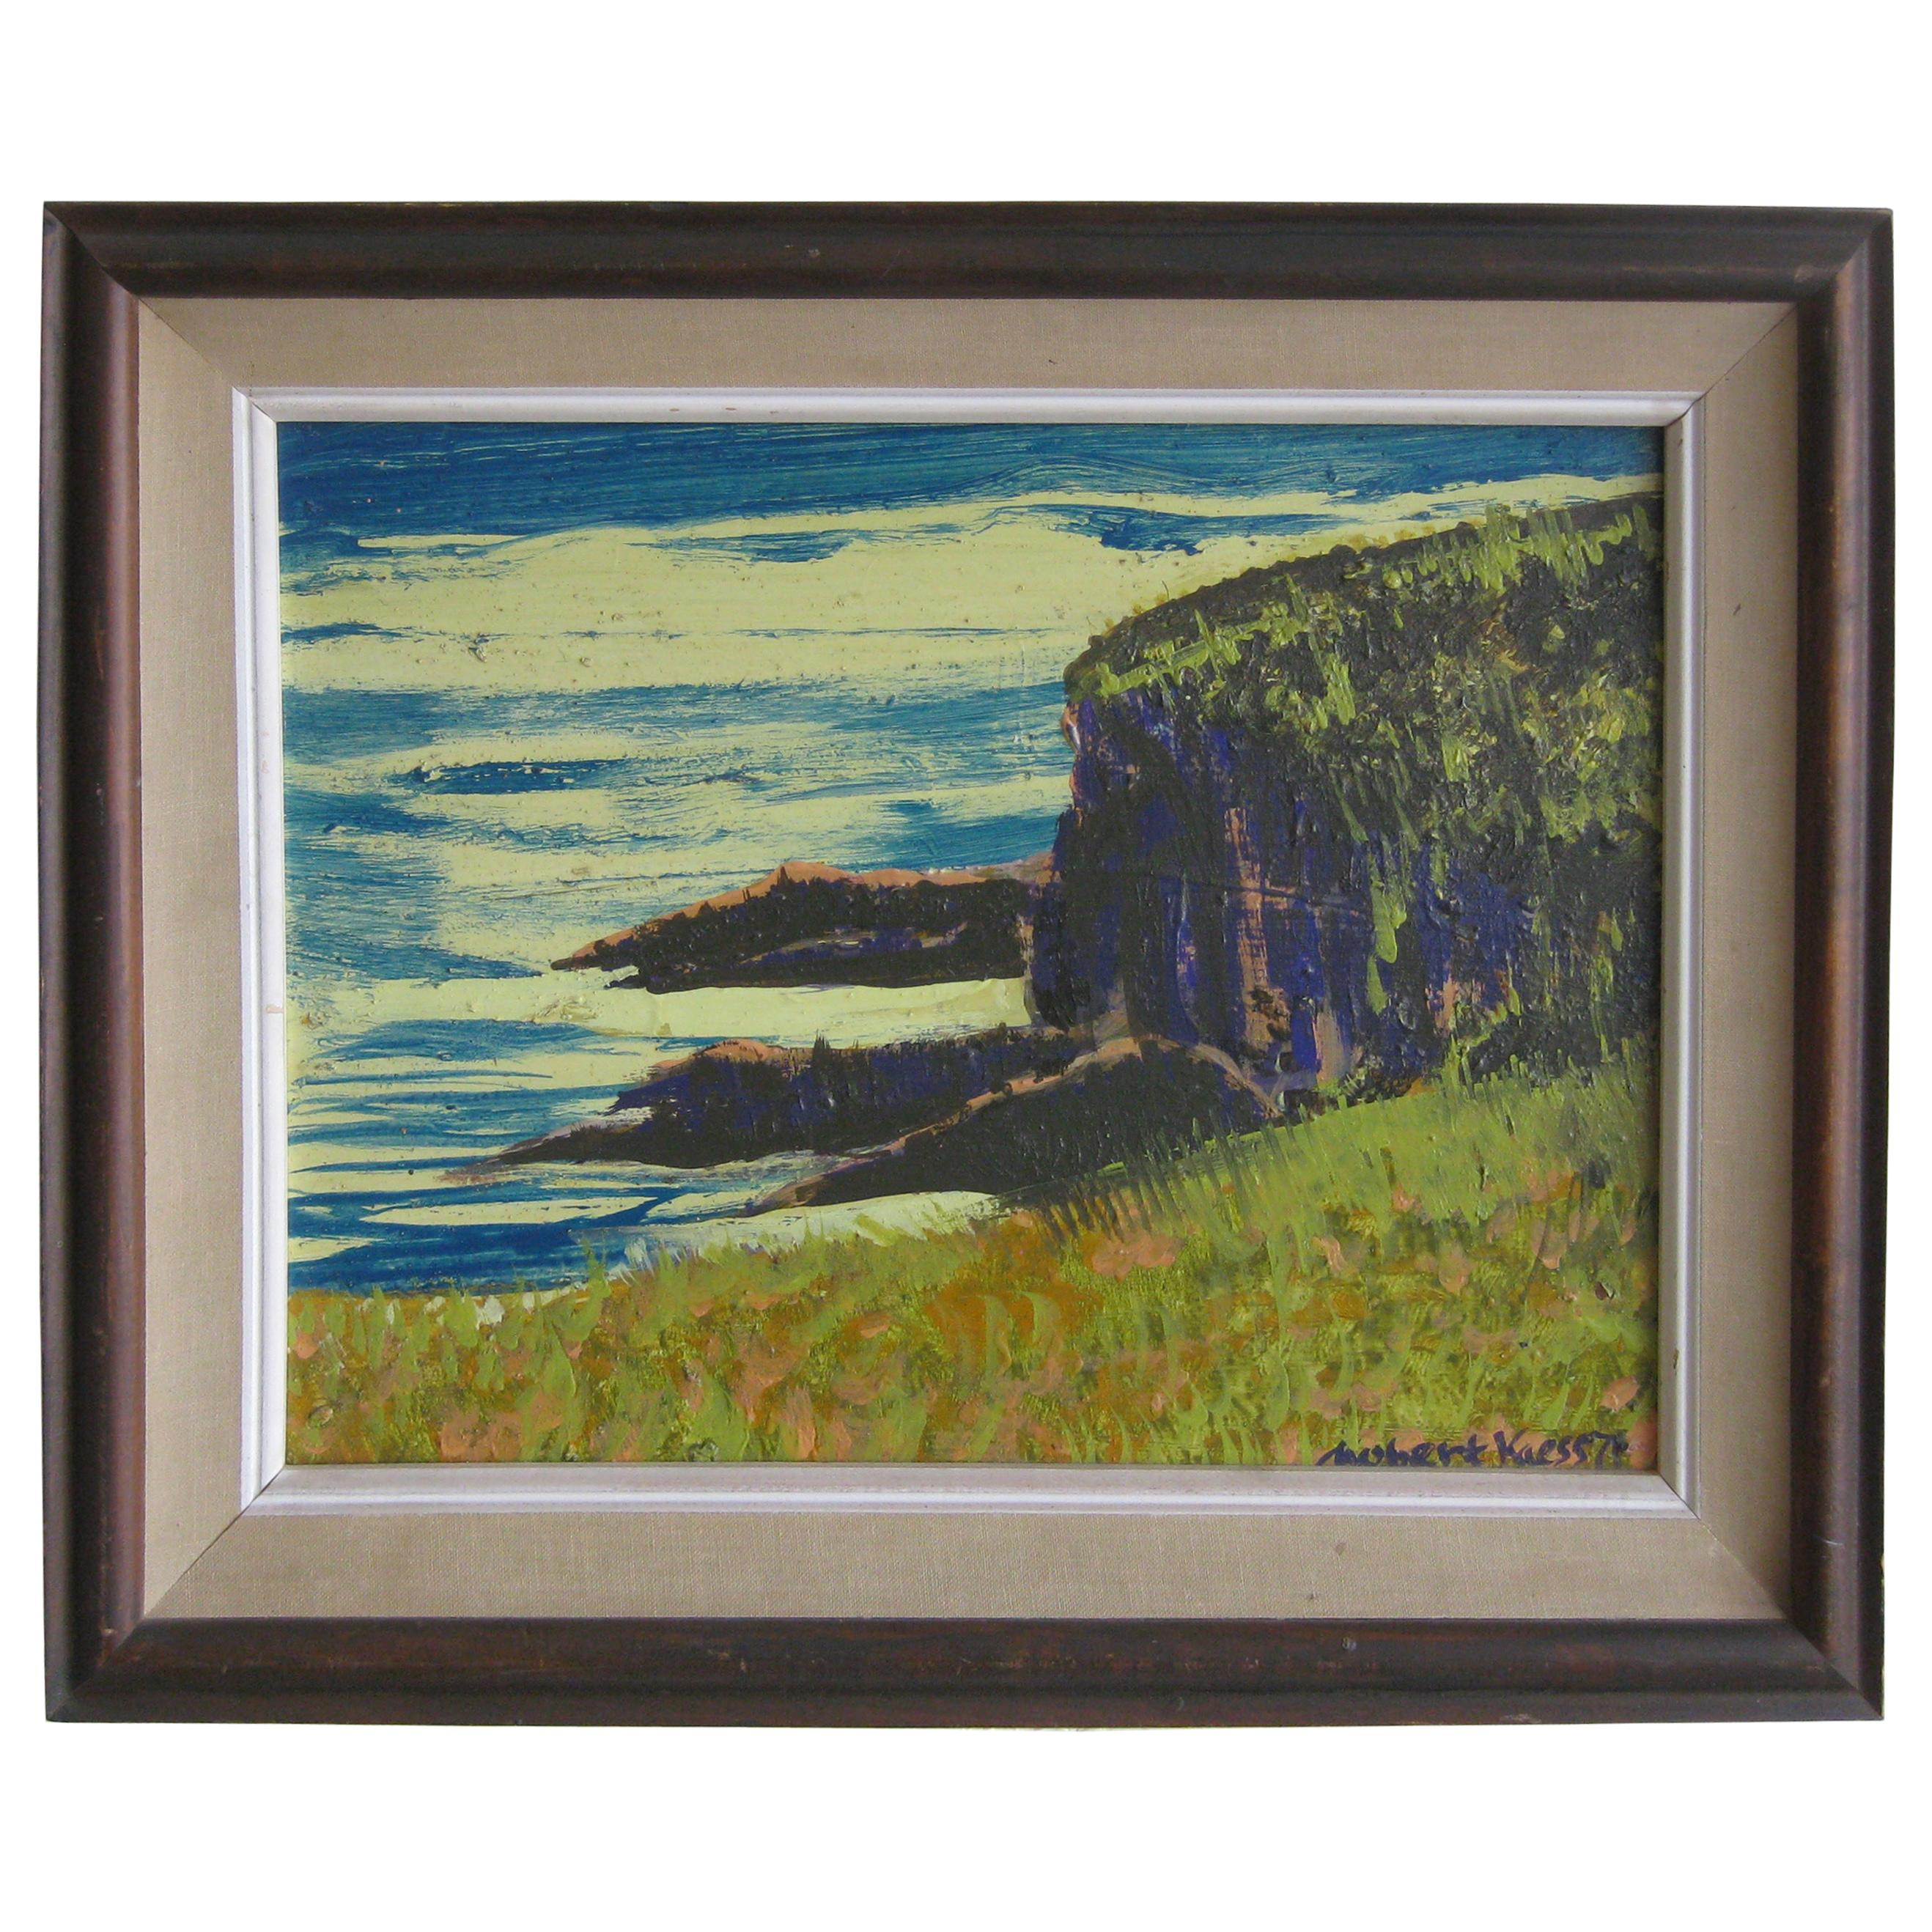 Robert Kaess California Listed Artist Abstract Seascape Oil Painting